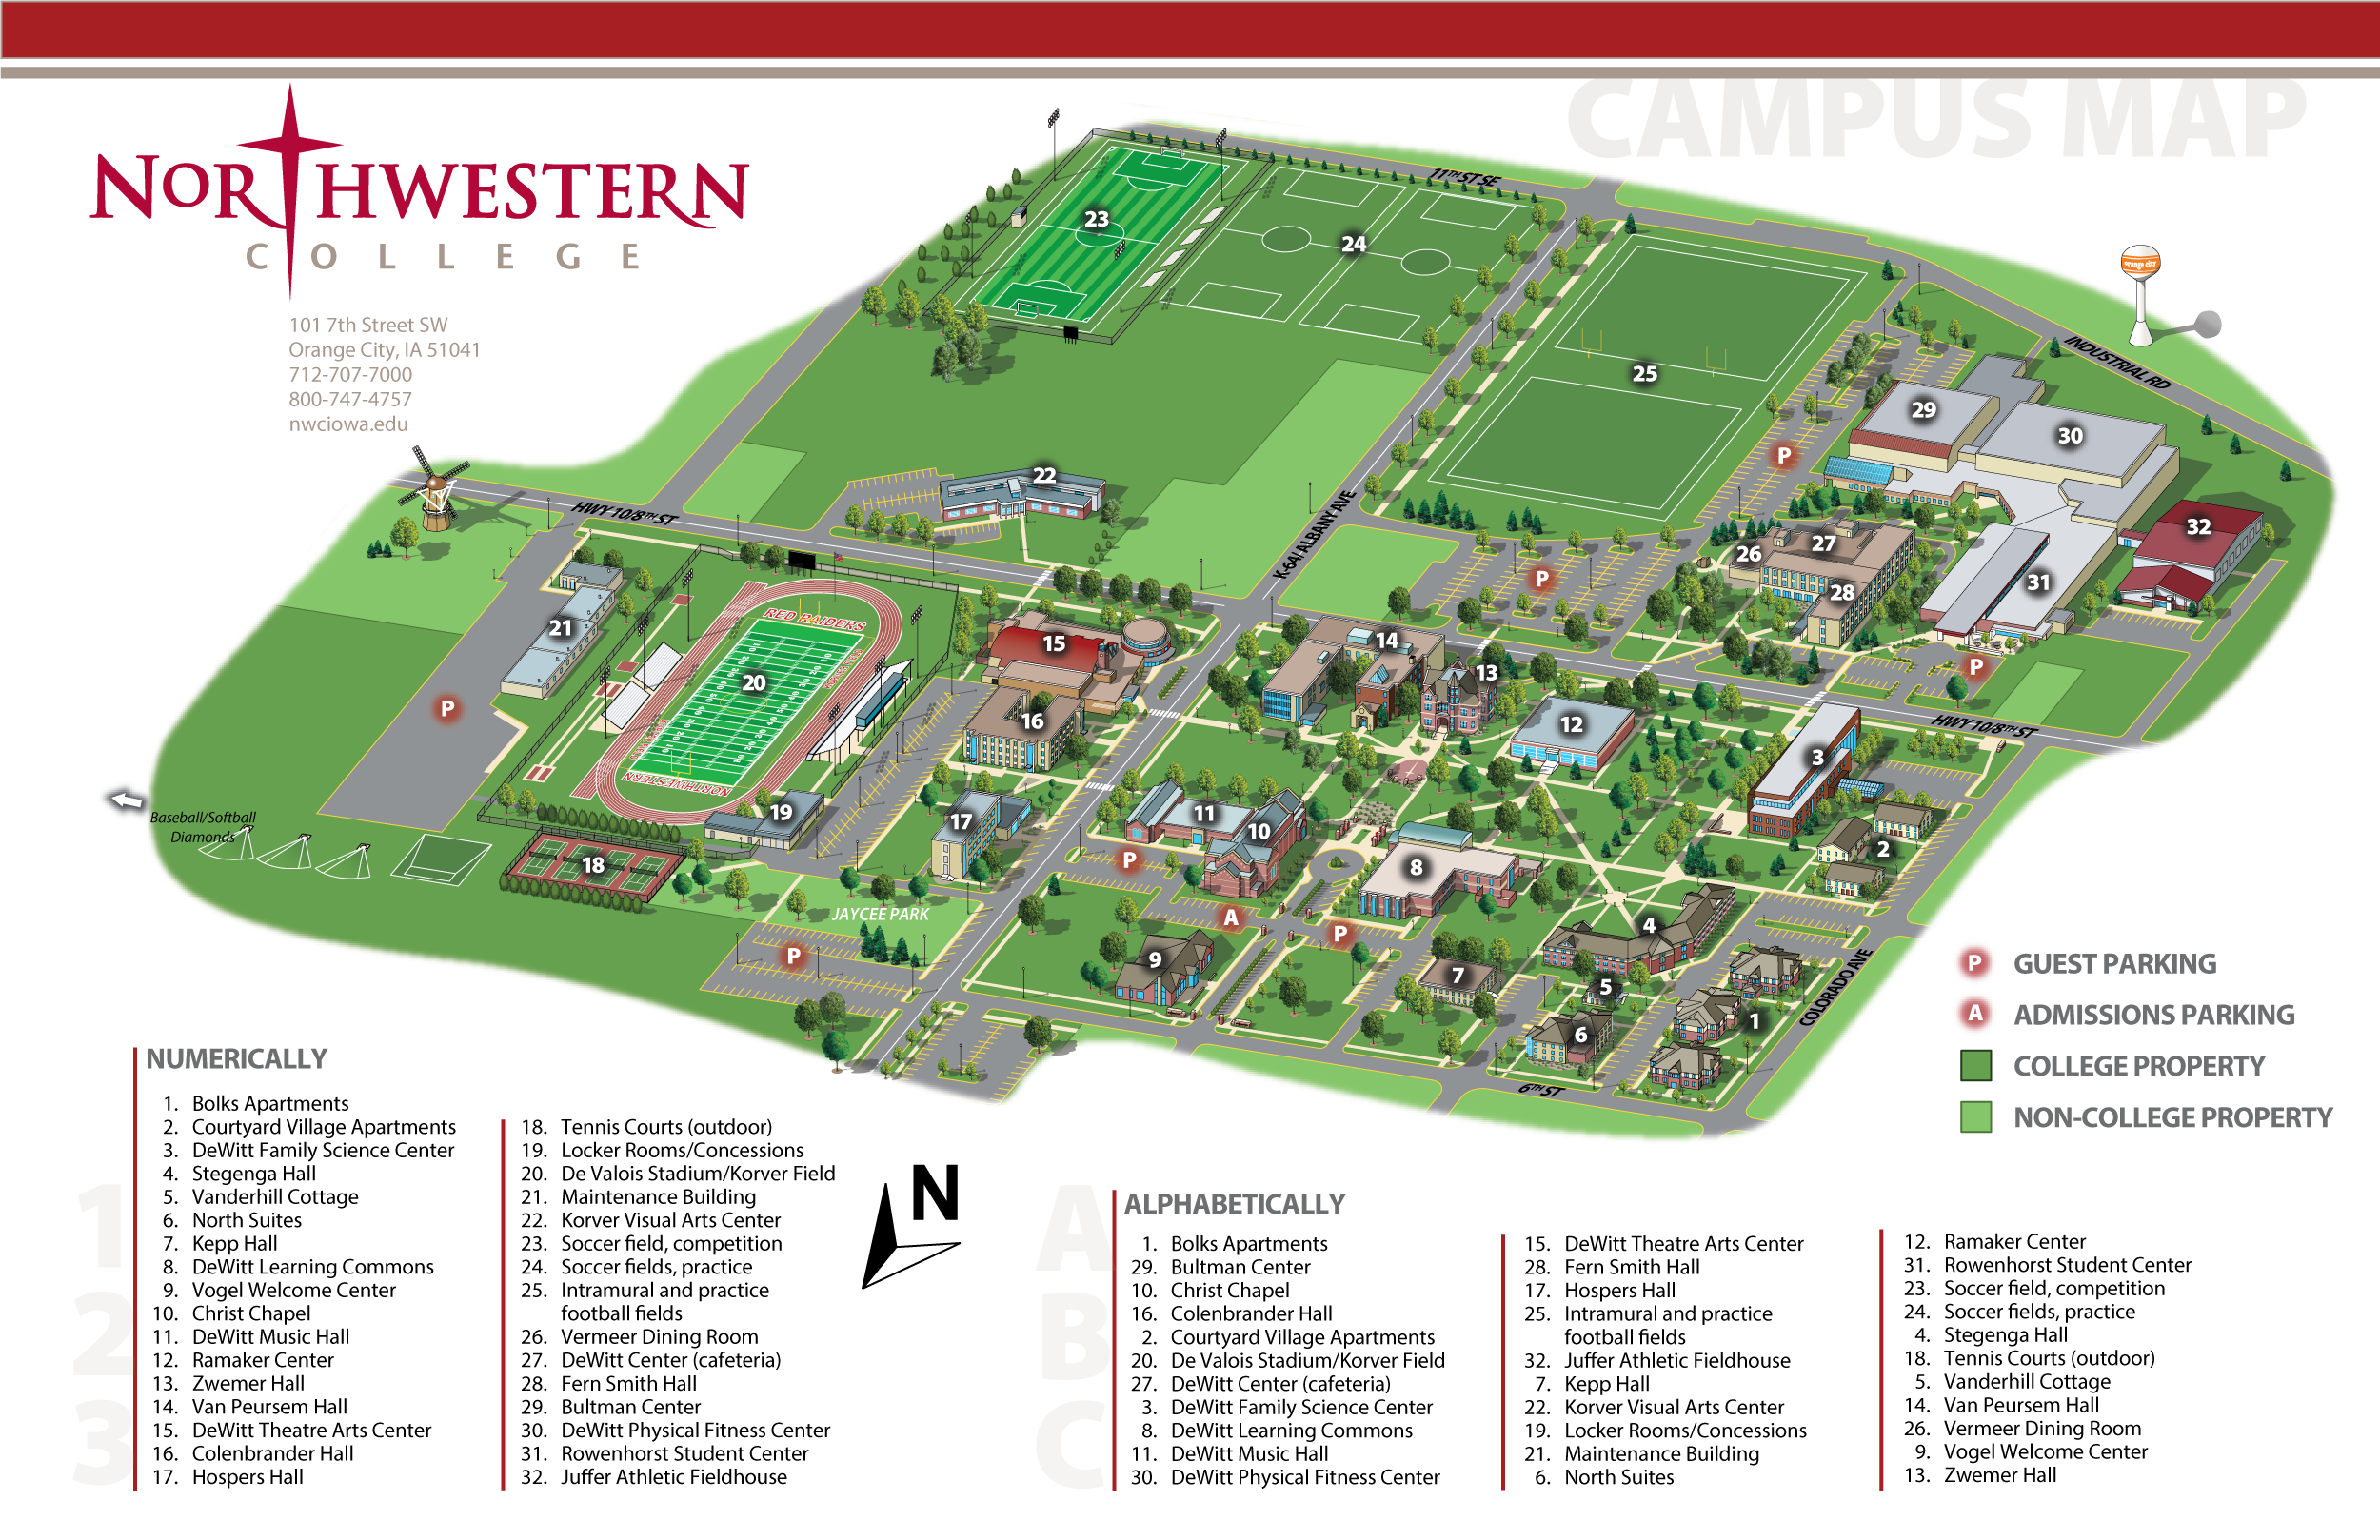 Campus map on city of iowa campus map, lake delhi ia map, isu campus map, north carolina a&t campus map, ia state amtrak map, iowa university map, iowa state map, gardner webb campus map,